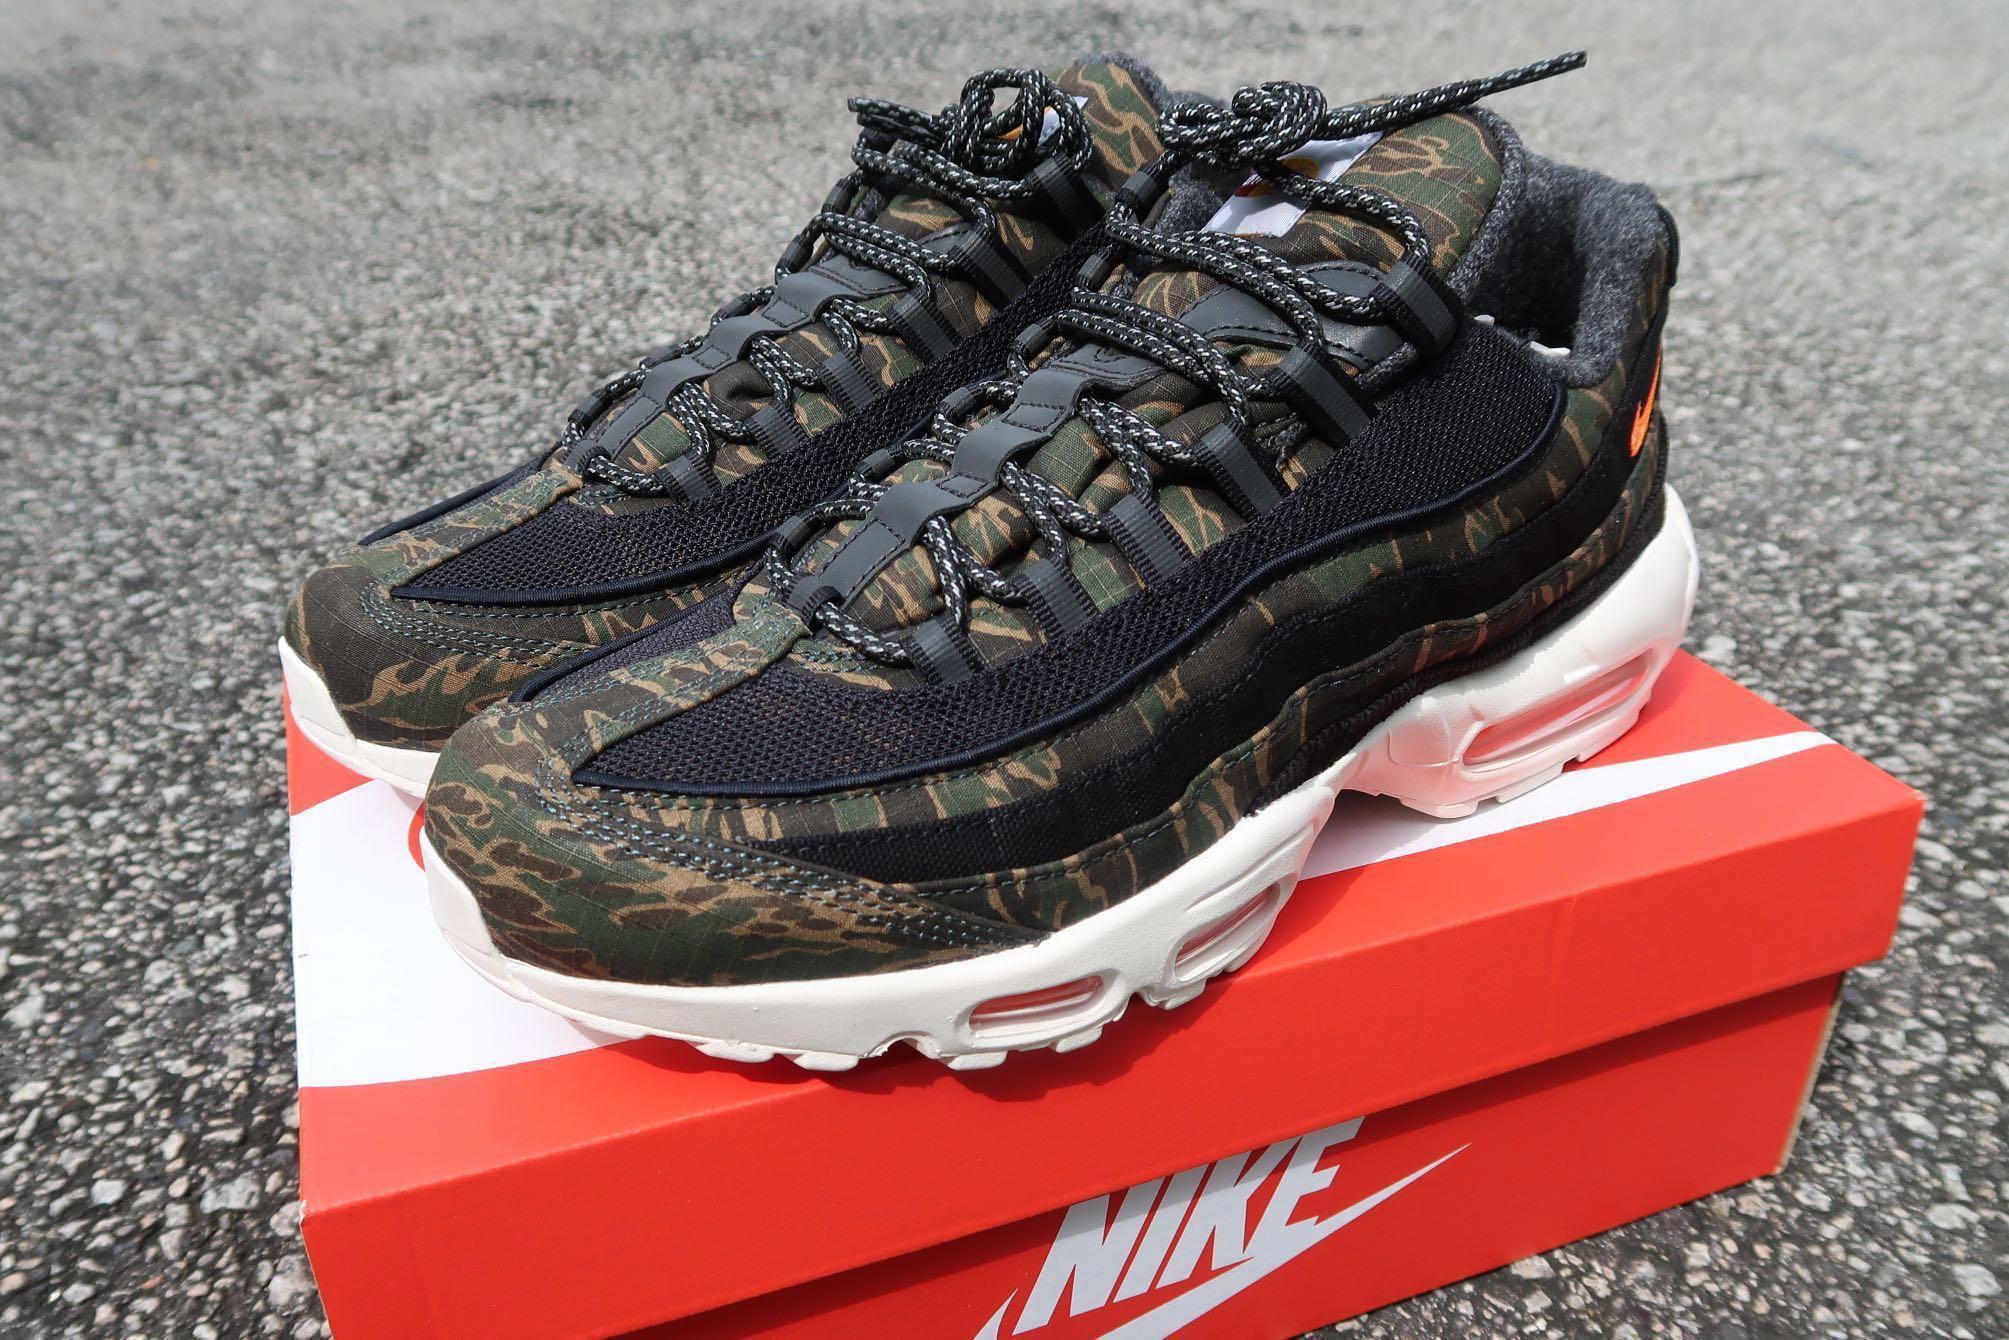 newest 06416 430b5 Nike Air Max 95 Carhartt WIP Camo, Men's Fashion, Footwear ...